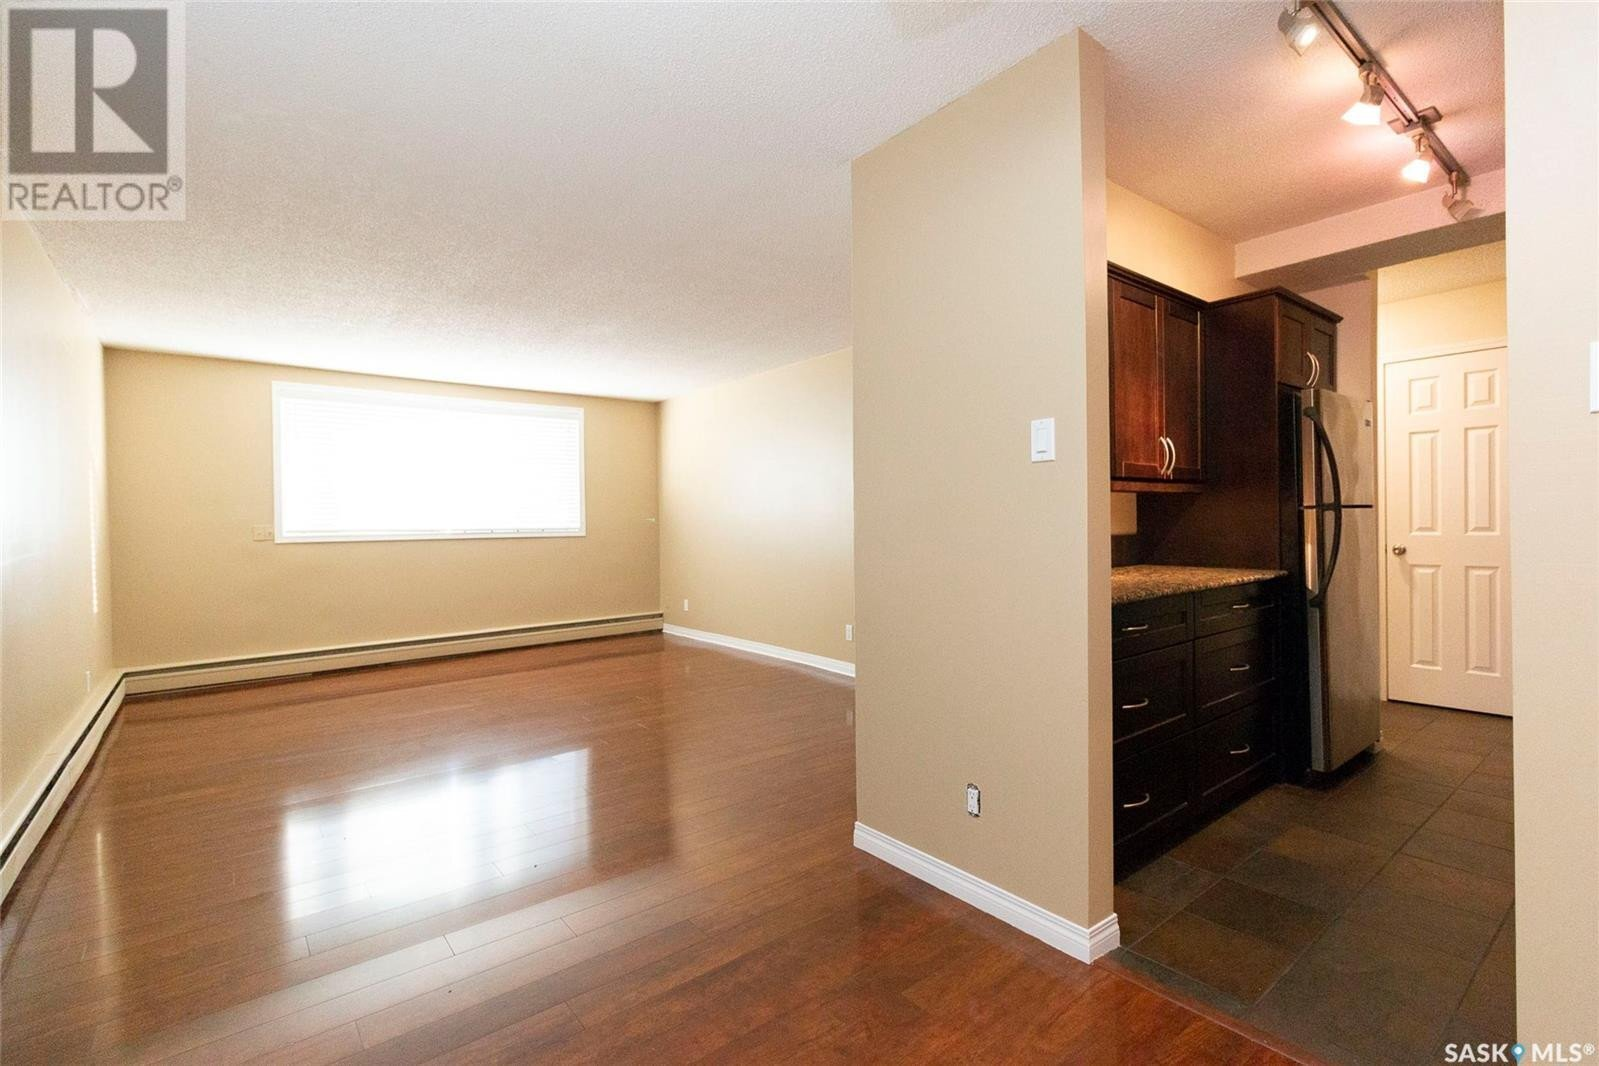 Condo for sale at 2 Summers Pl Unit 7 Saskatoon Saskatchewan - MLS: SK828416